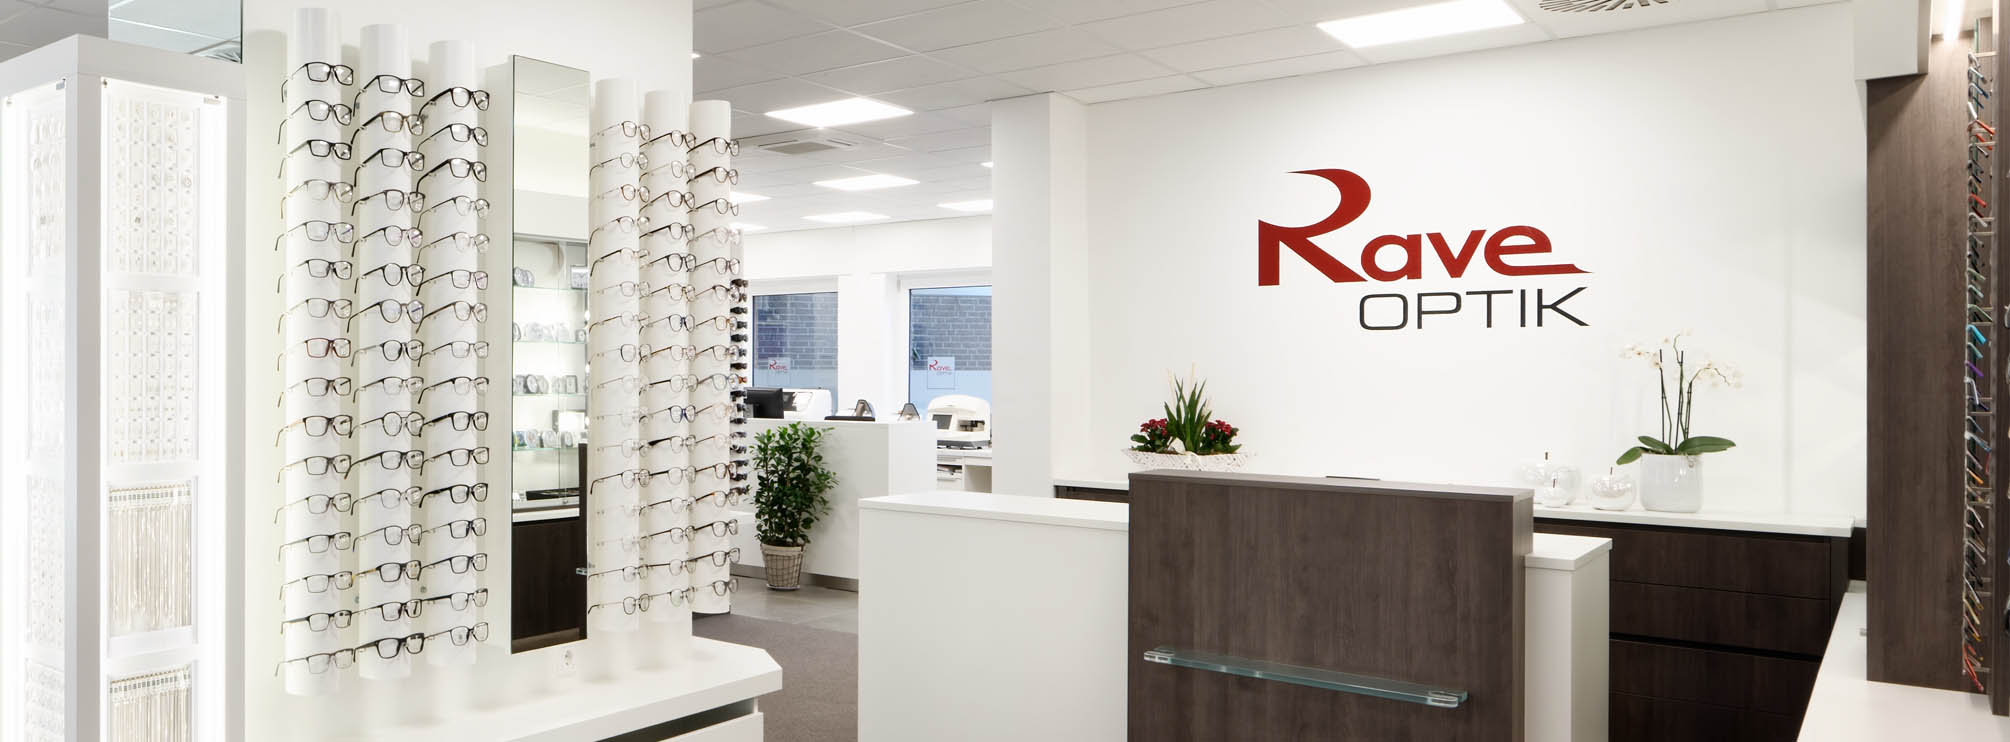 Brillen bei Optik Rave